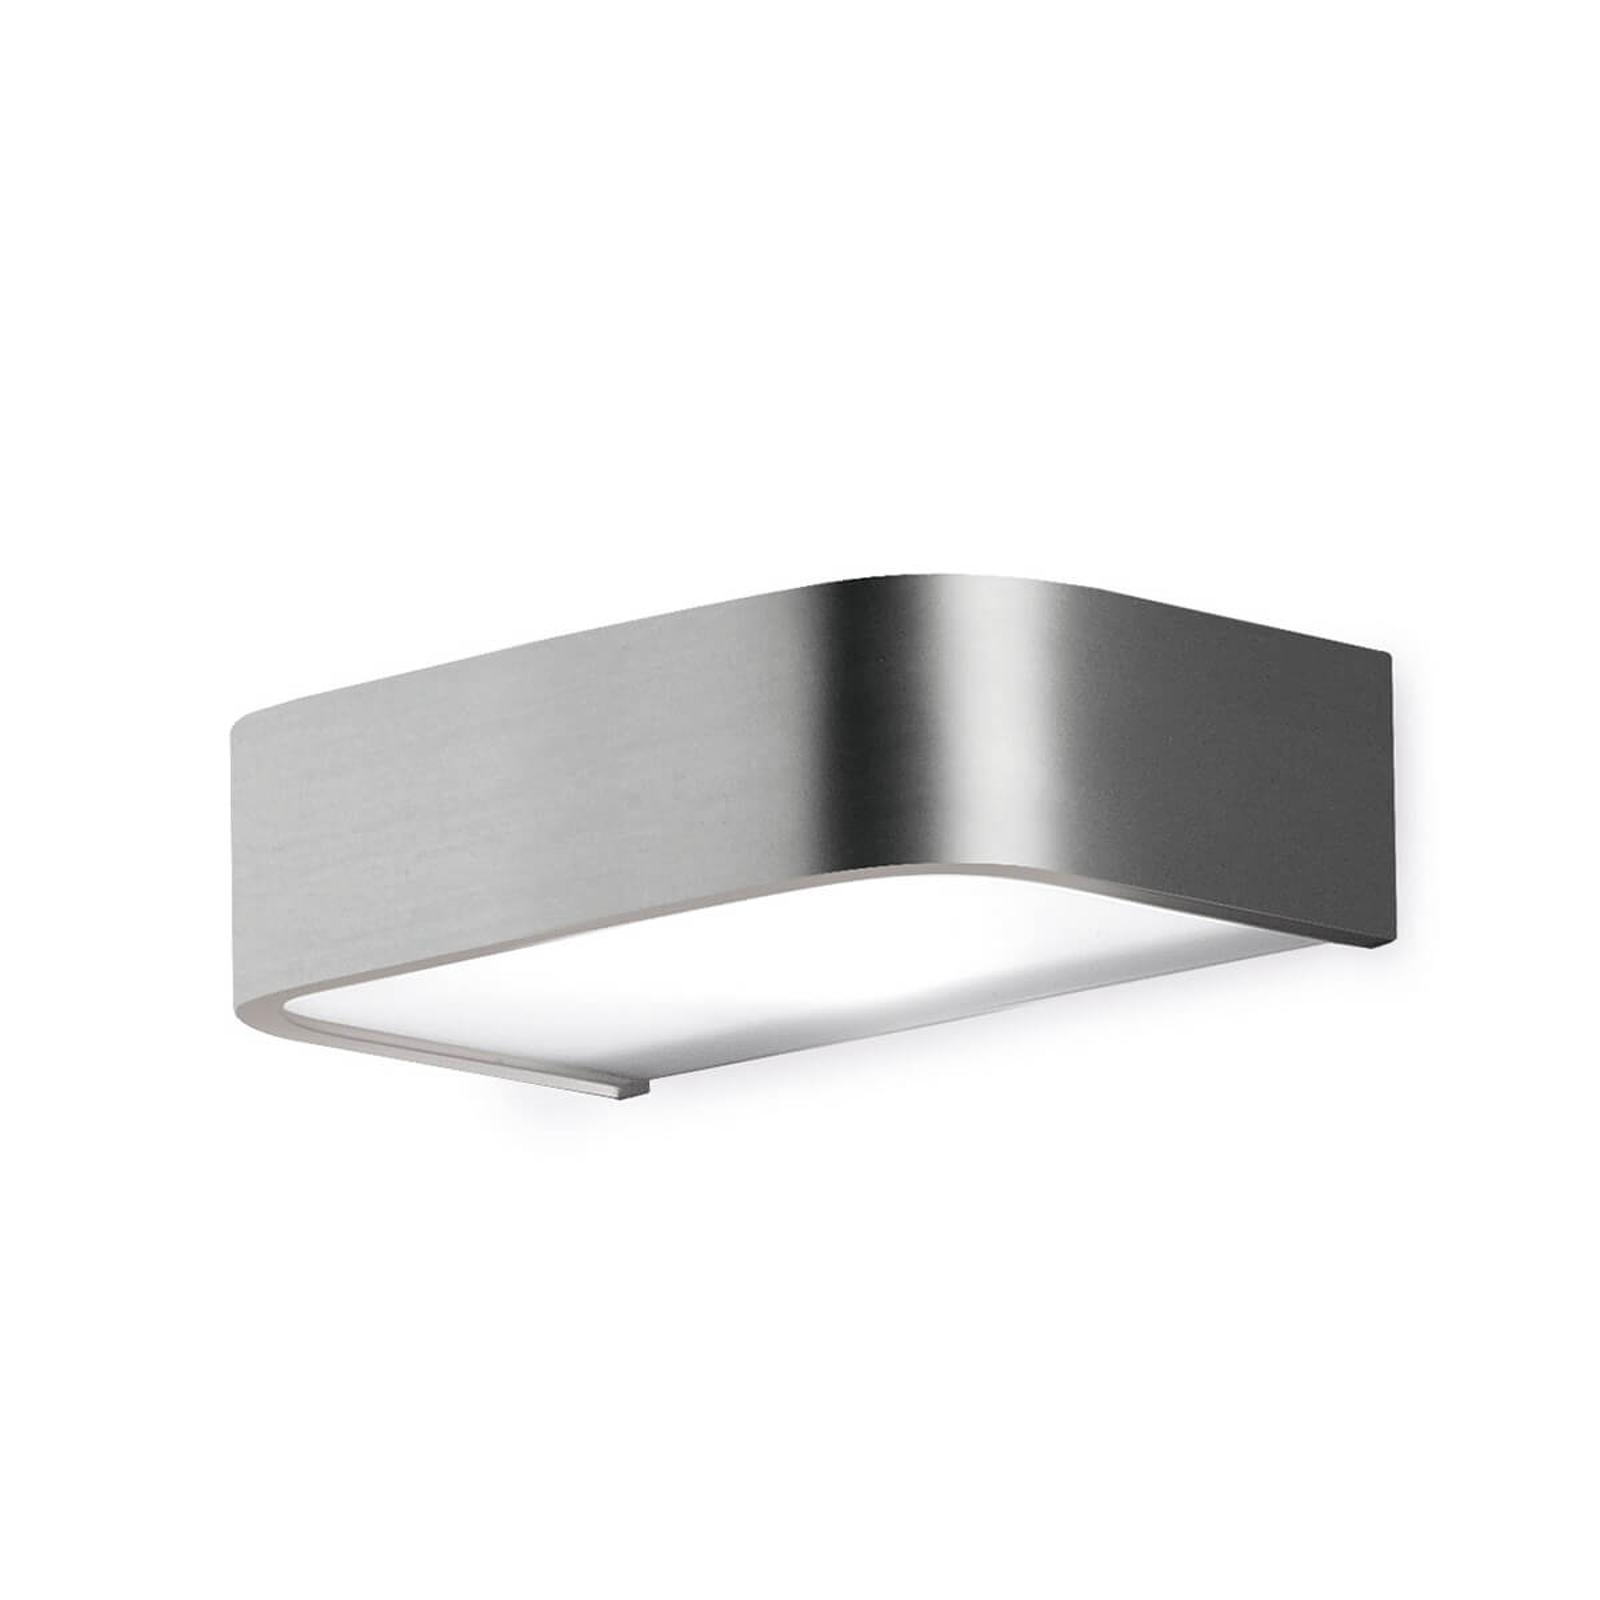 Applique de salle de bain Arcos LED, 15cm nickel